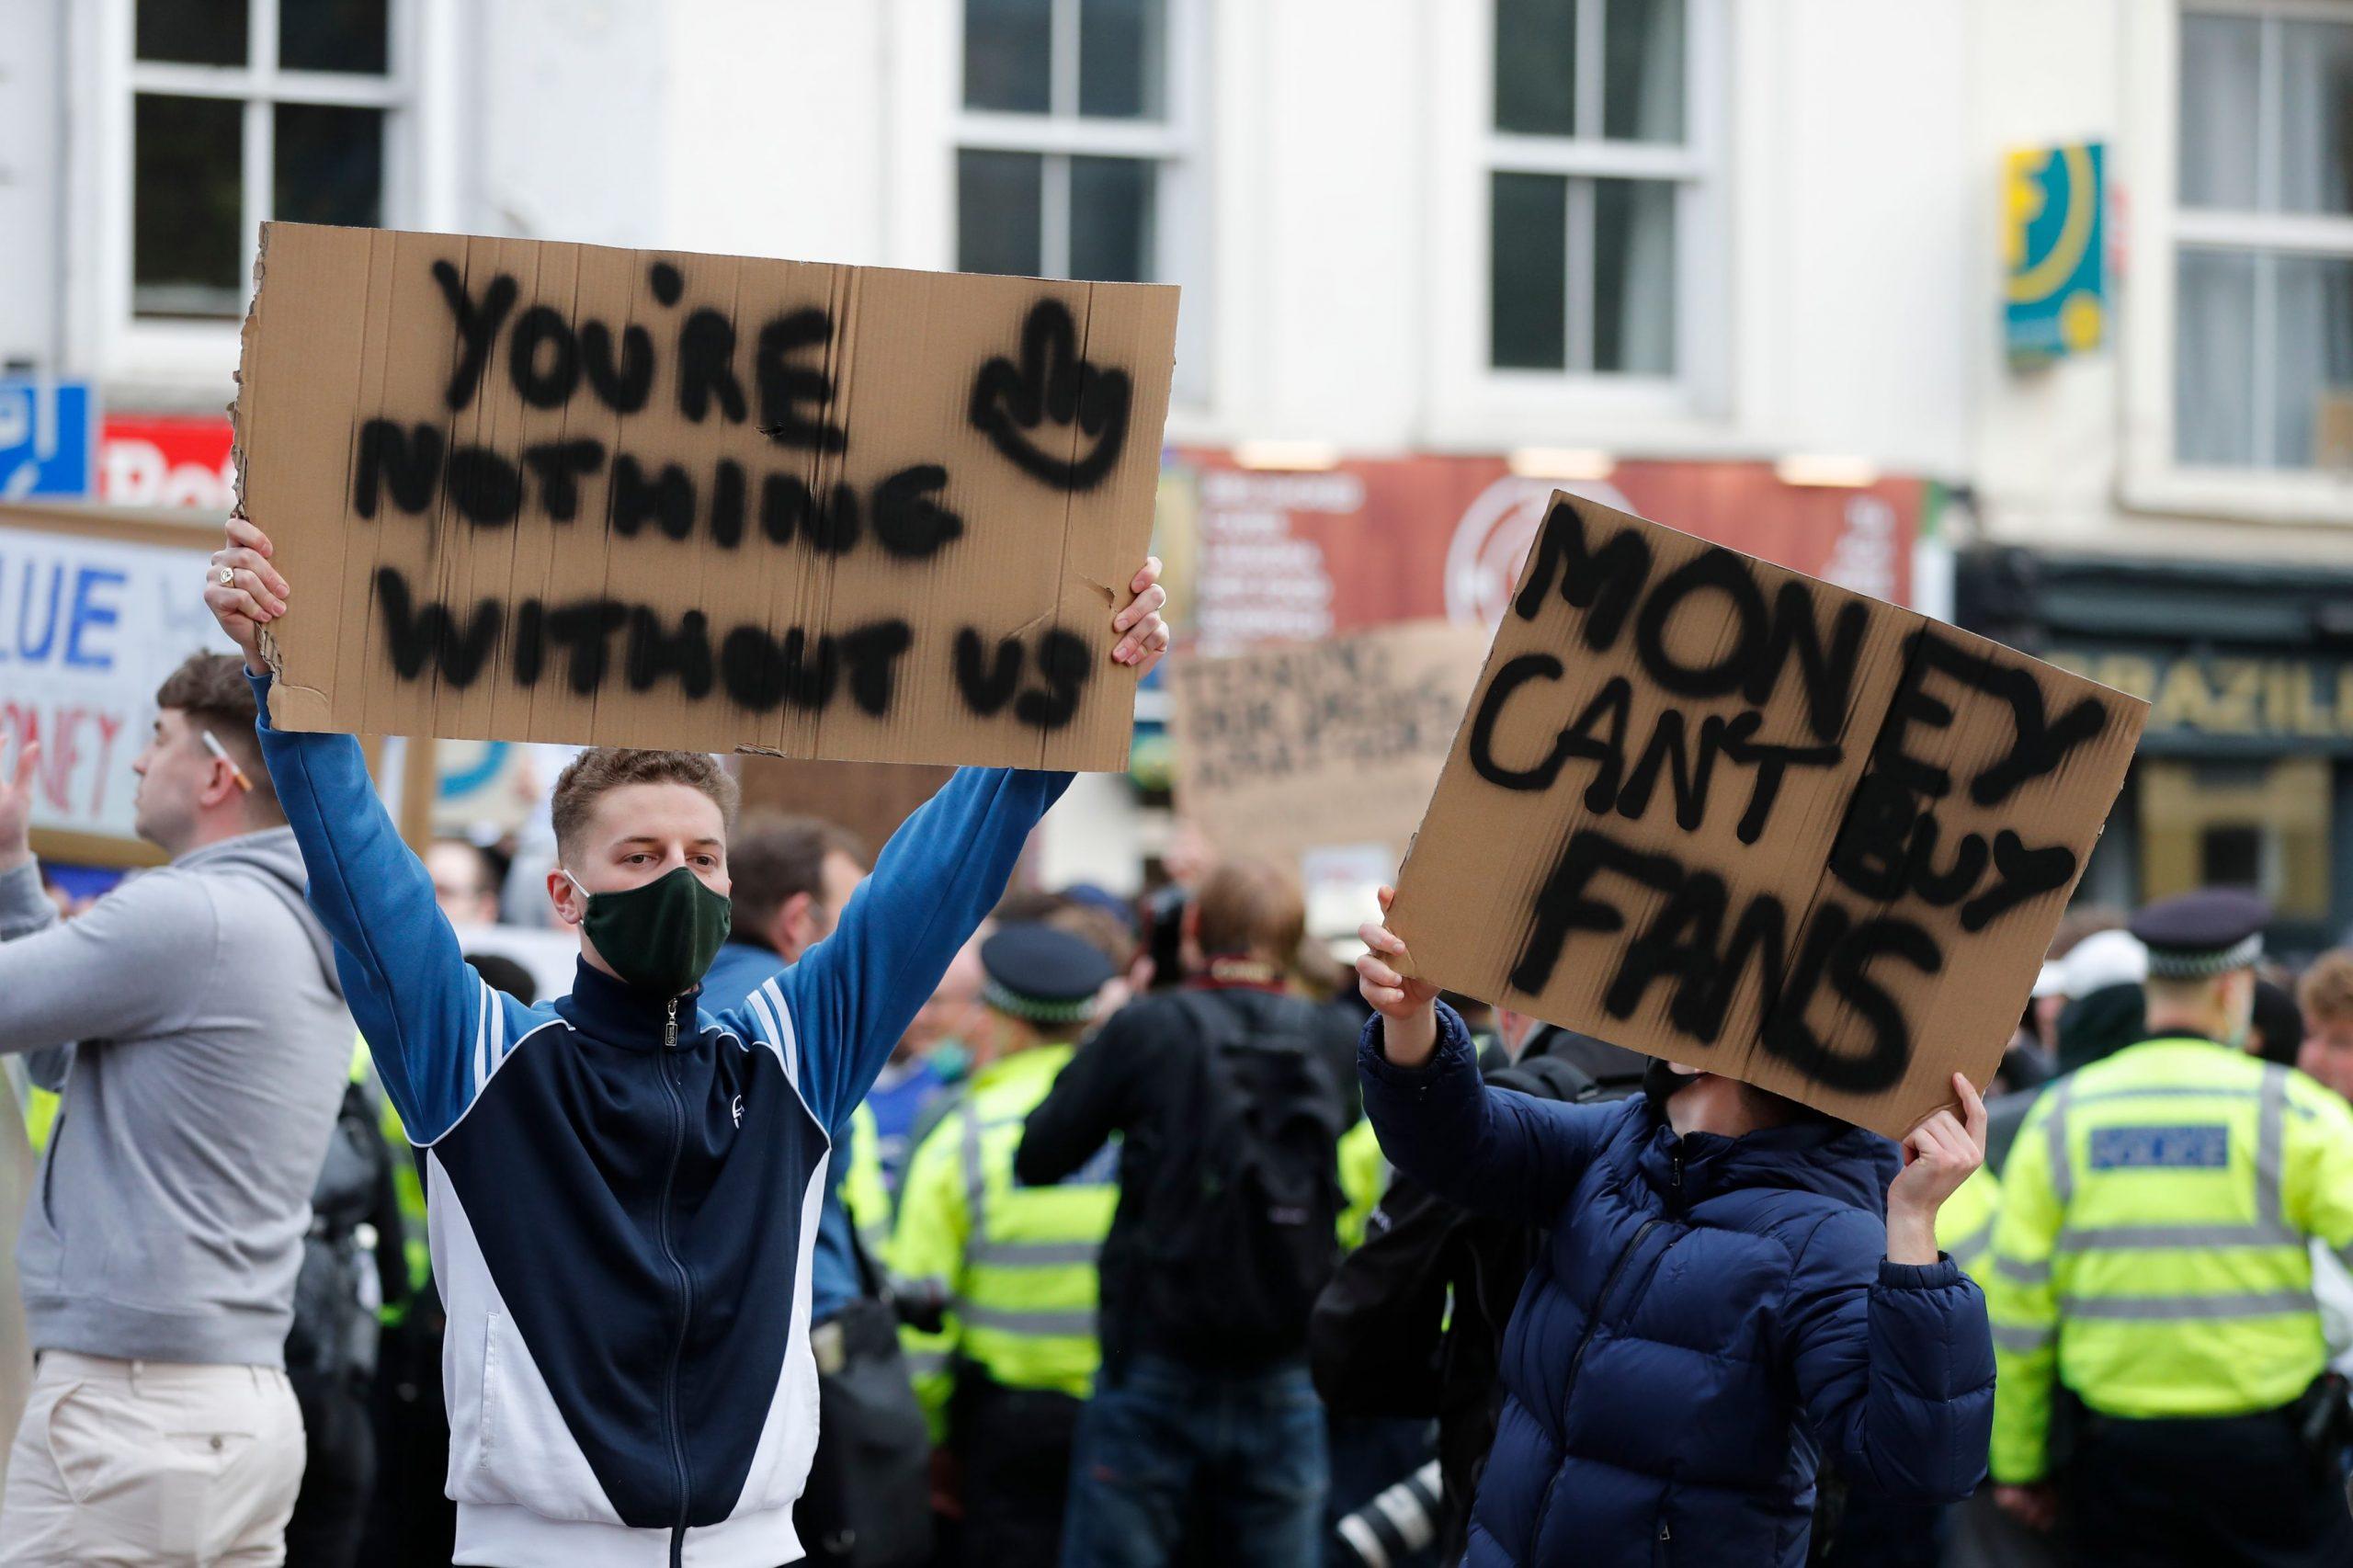 Navijači Chelseaja ispred stadiona/Foto REUTERS